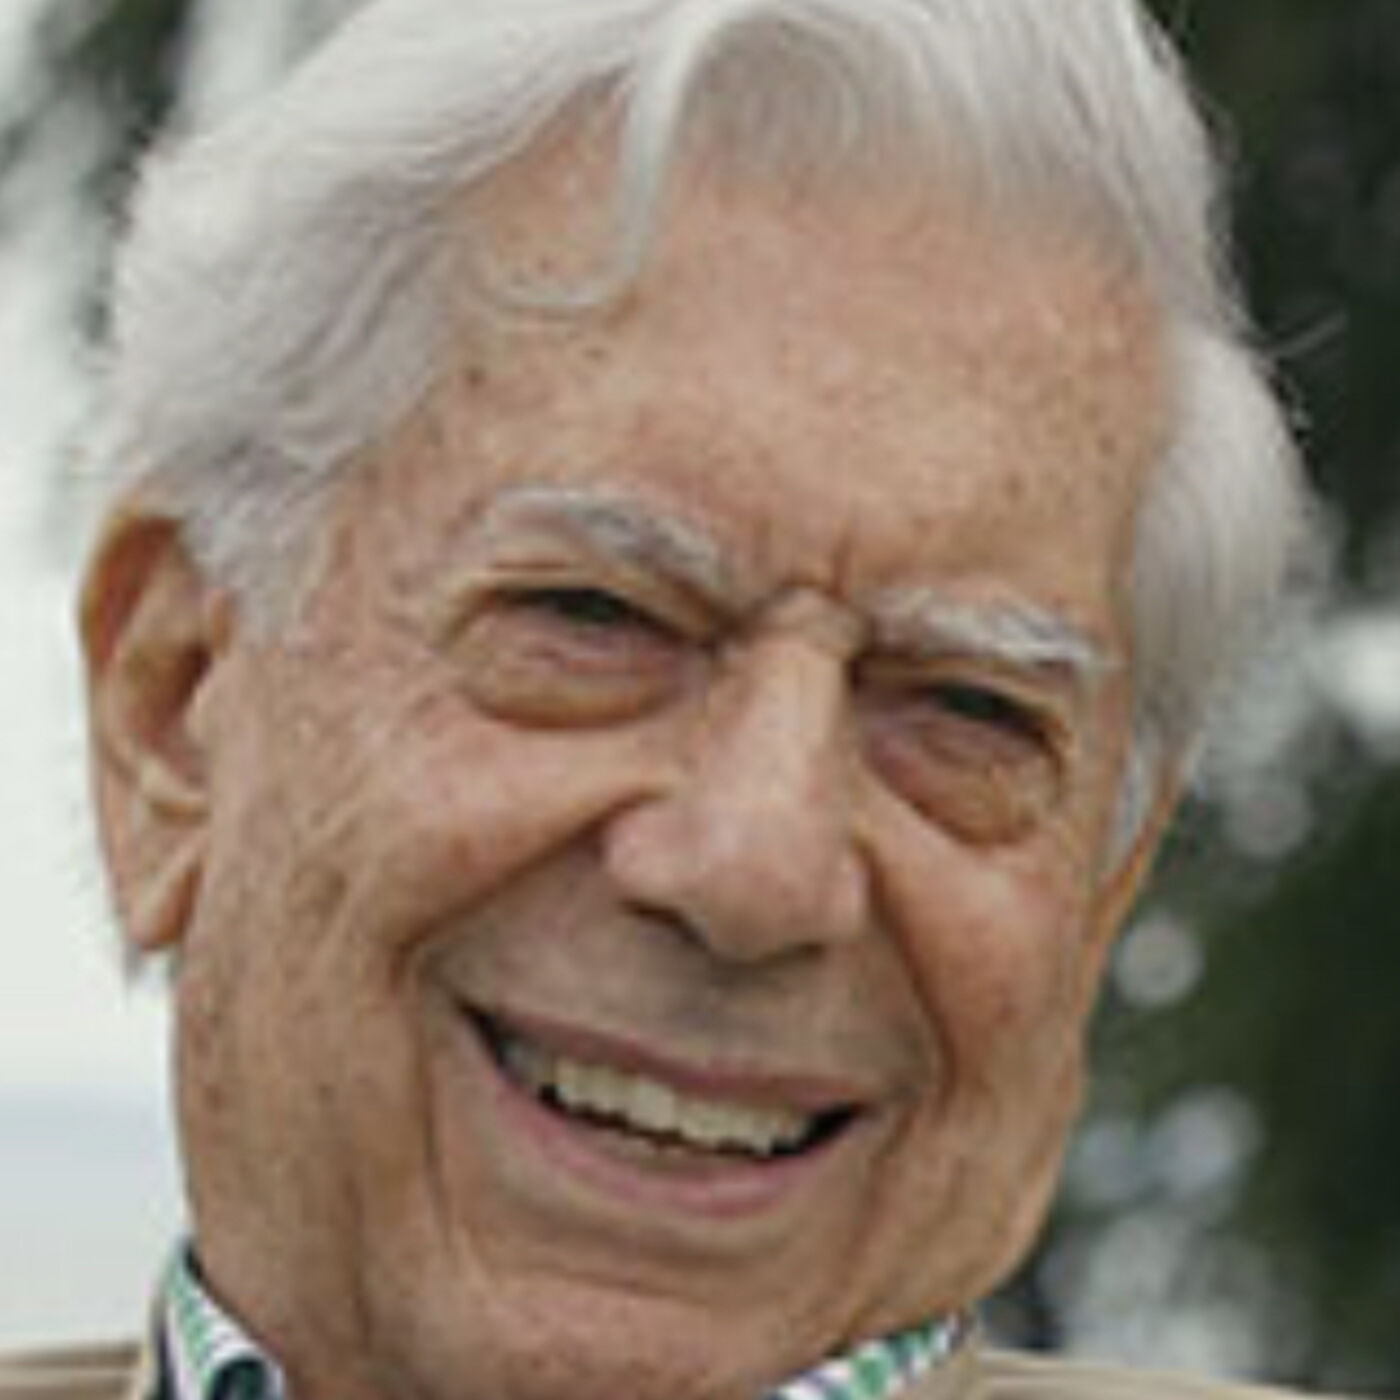 Mario Vargas Llosa: Literature Makes Citizens Critical